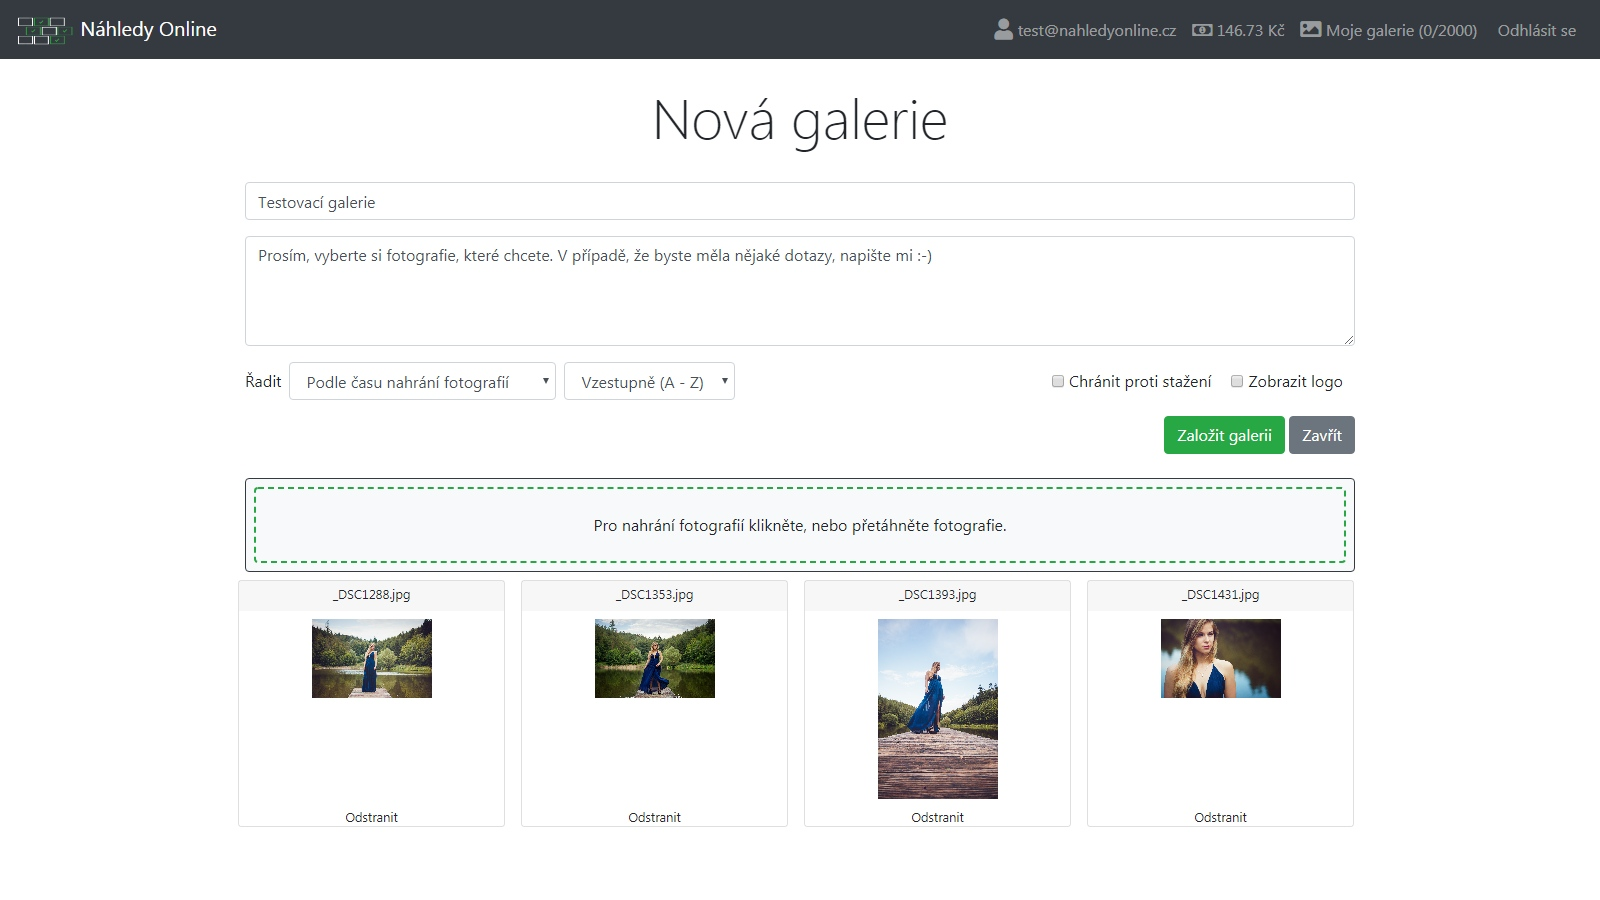 Vytvořte si galerii, doplňte popis pro Vašeho klienta a nahrajte fotografie.